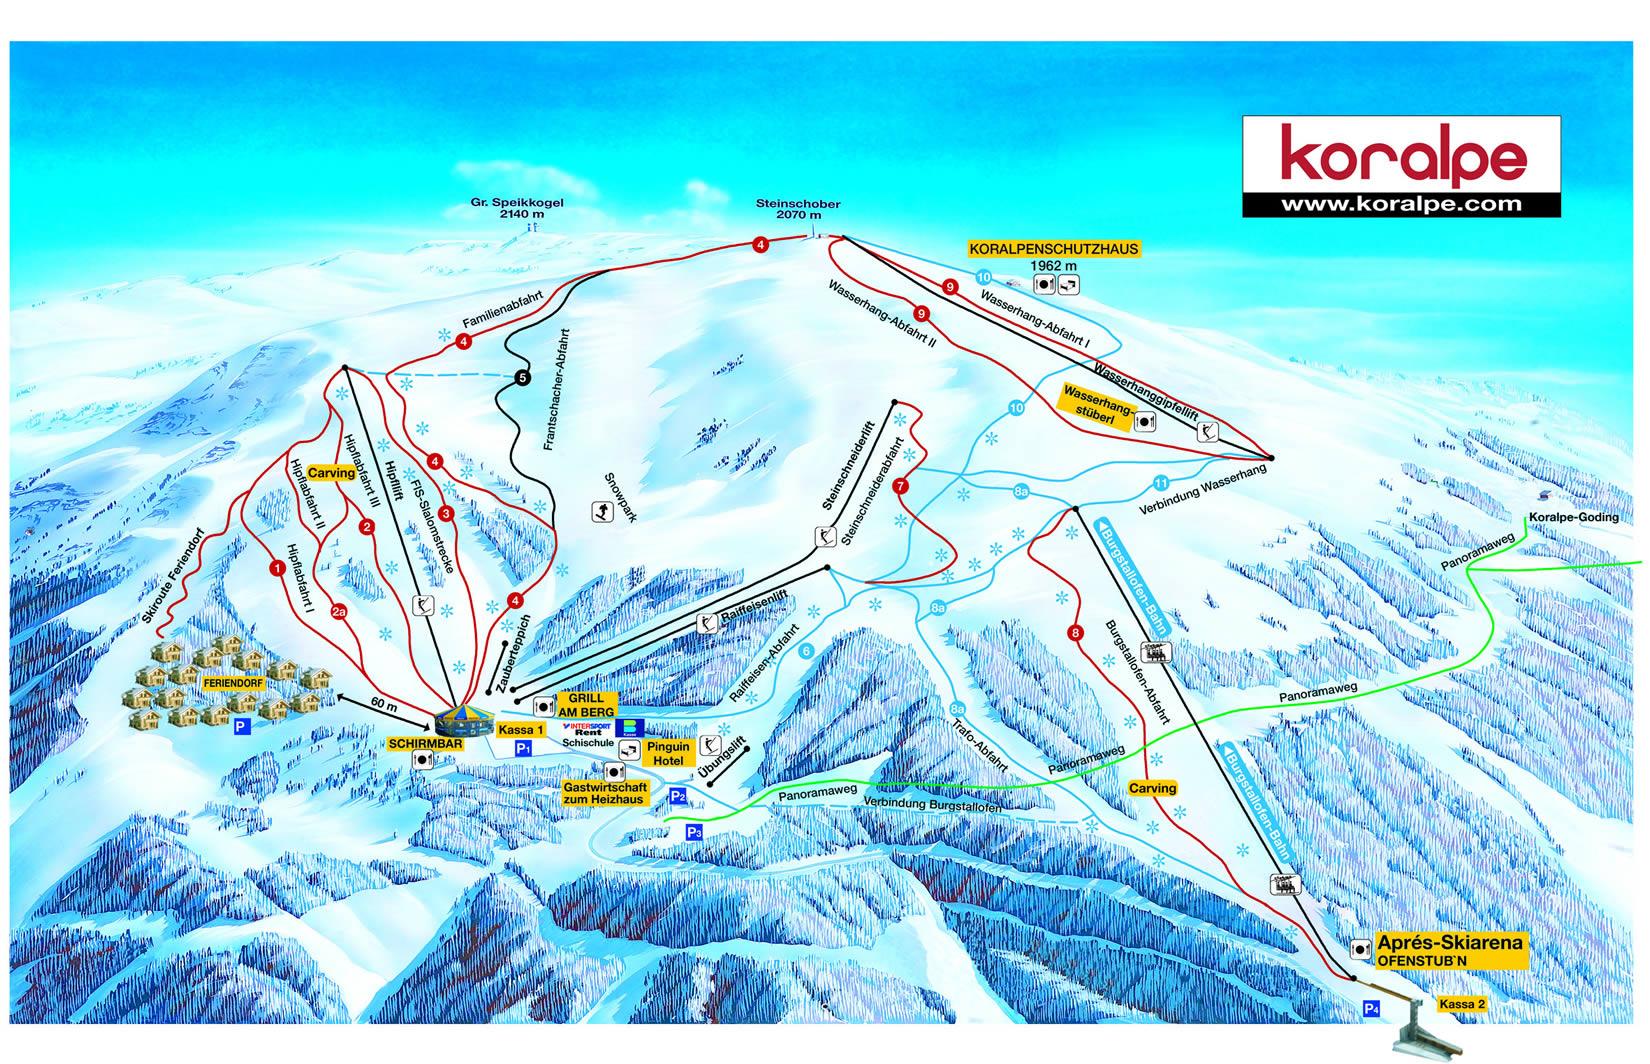 Koralpe Piste / Trail Map